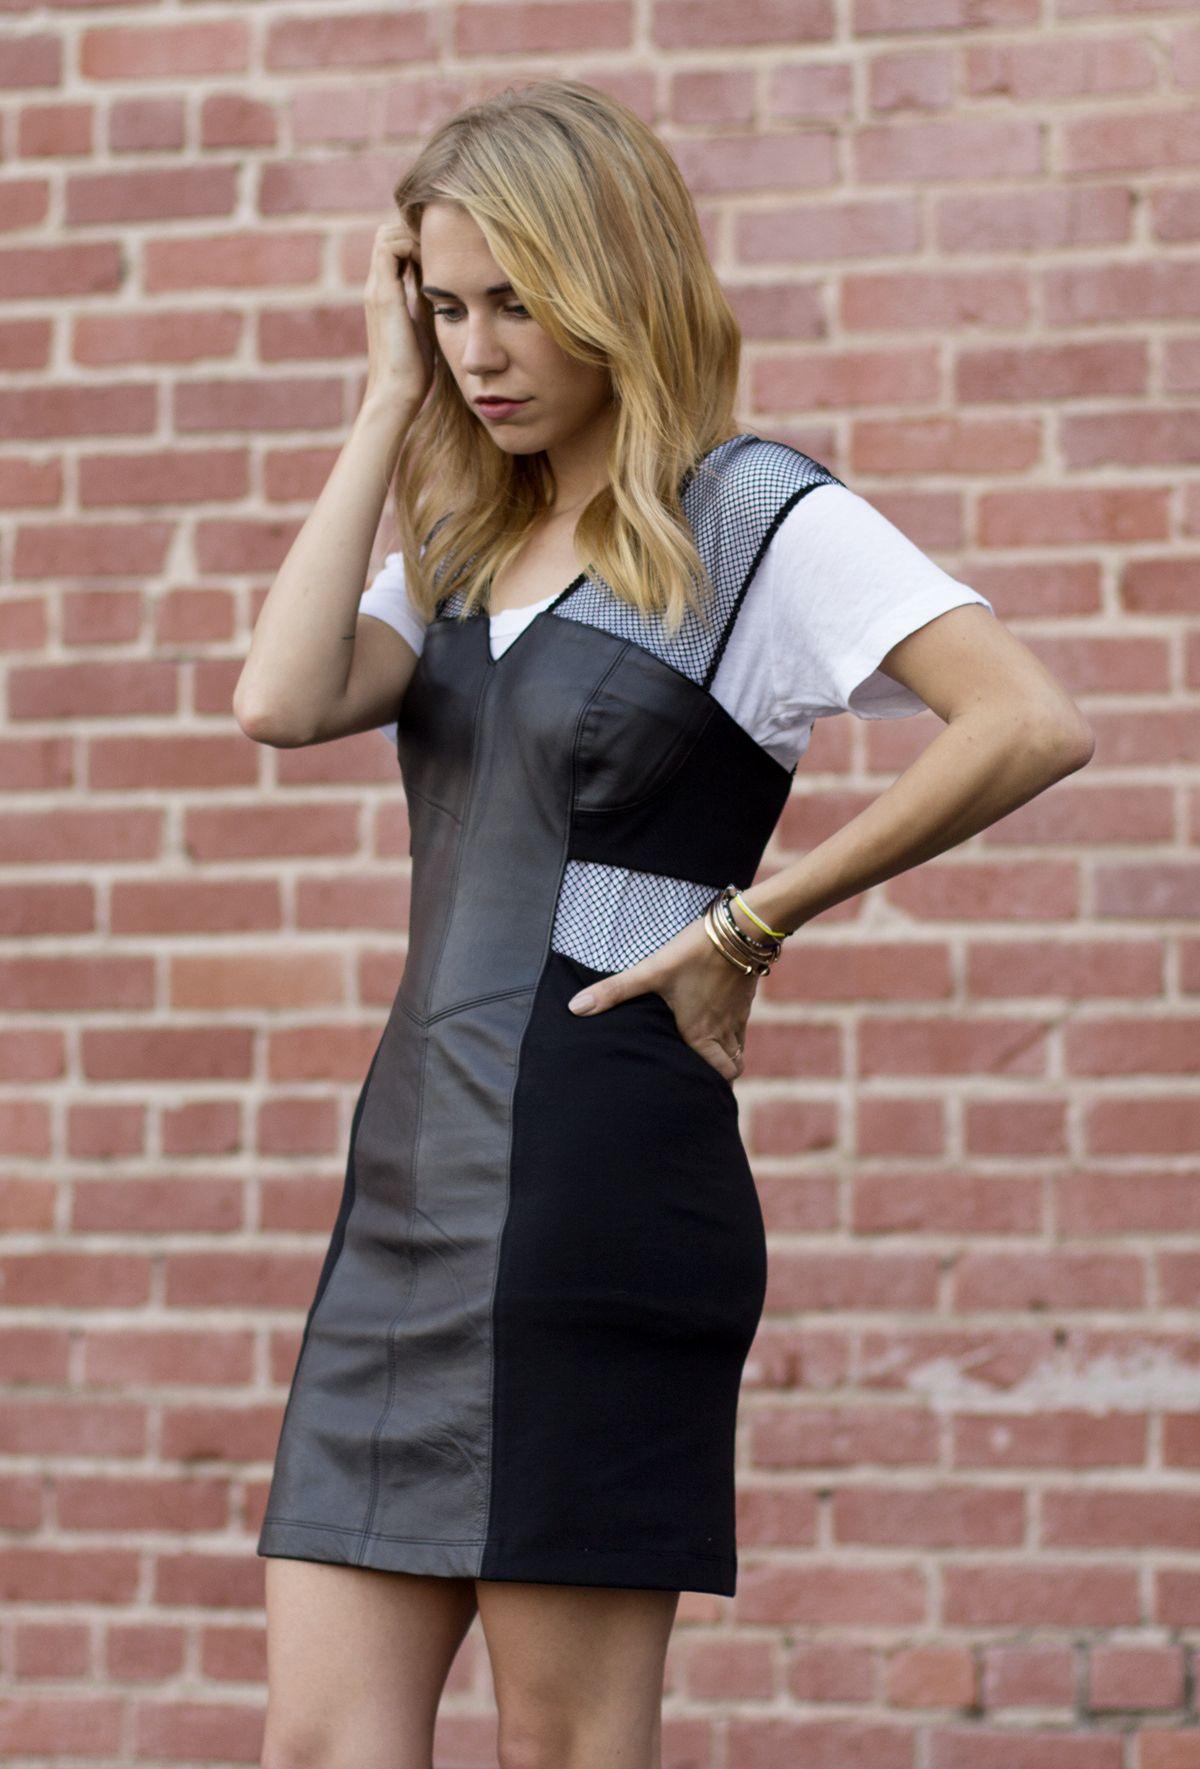 Lna Tee Veda Leather Dress Blogger Always Judging